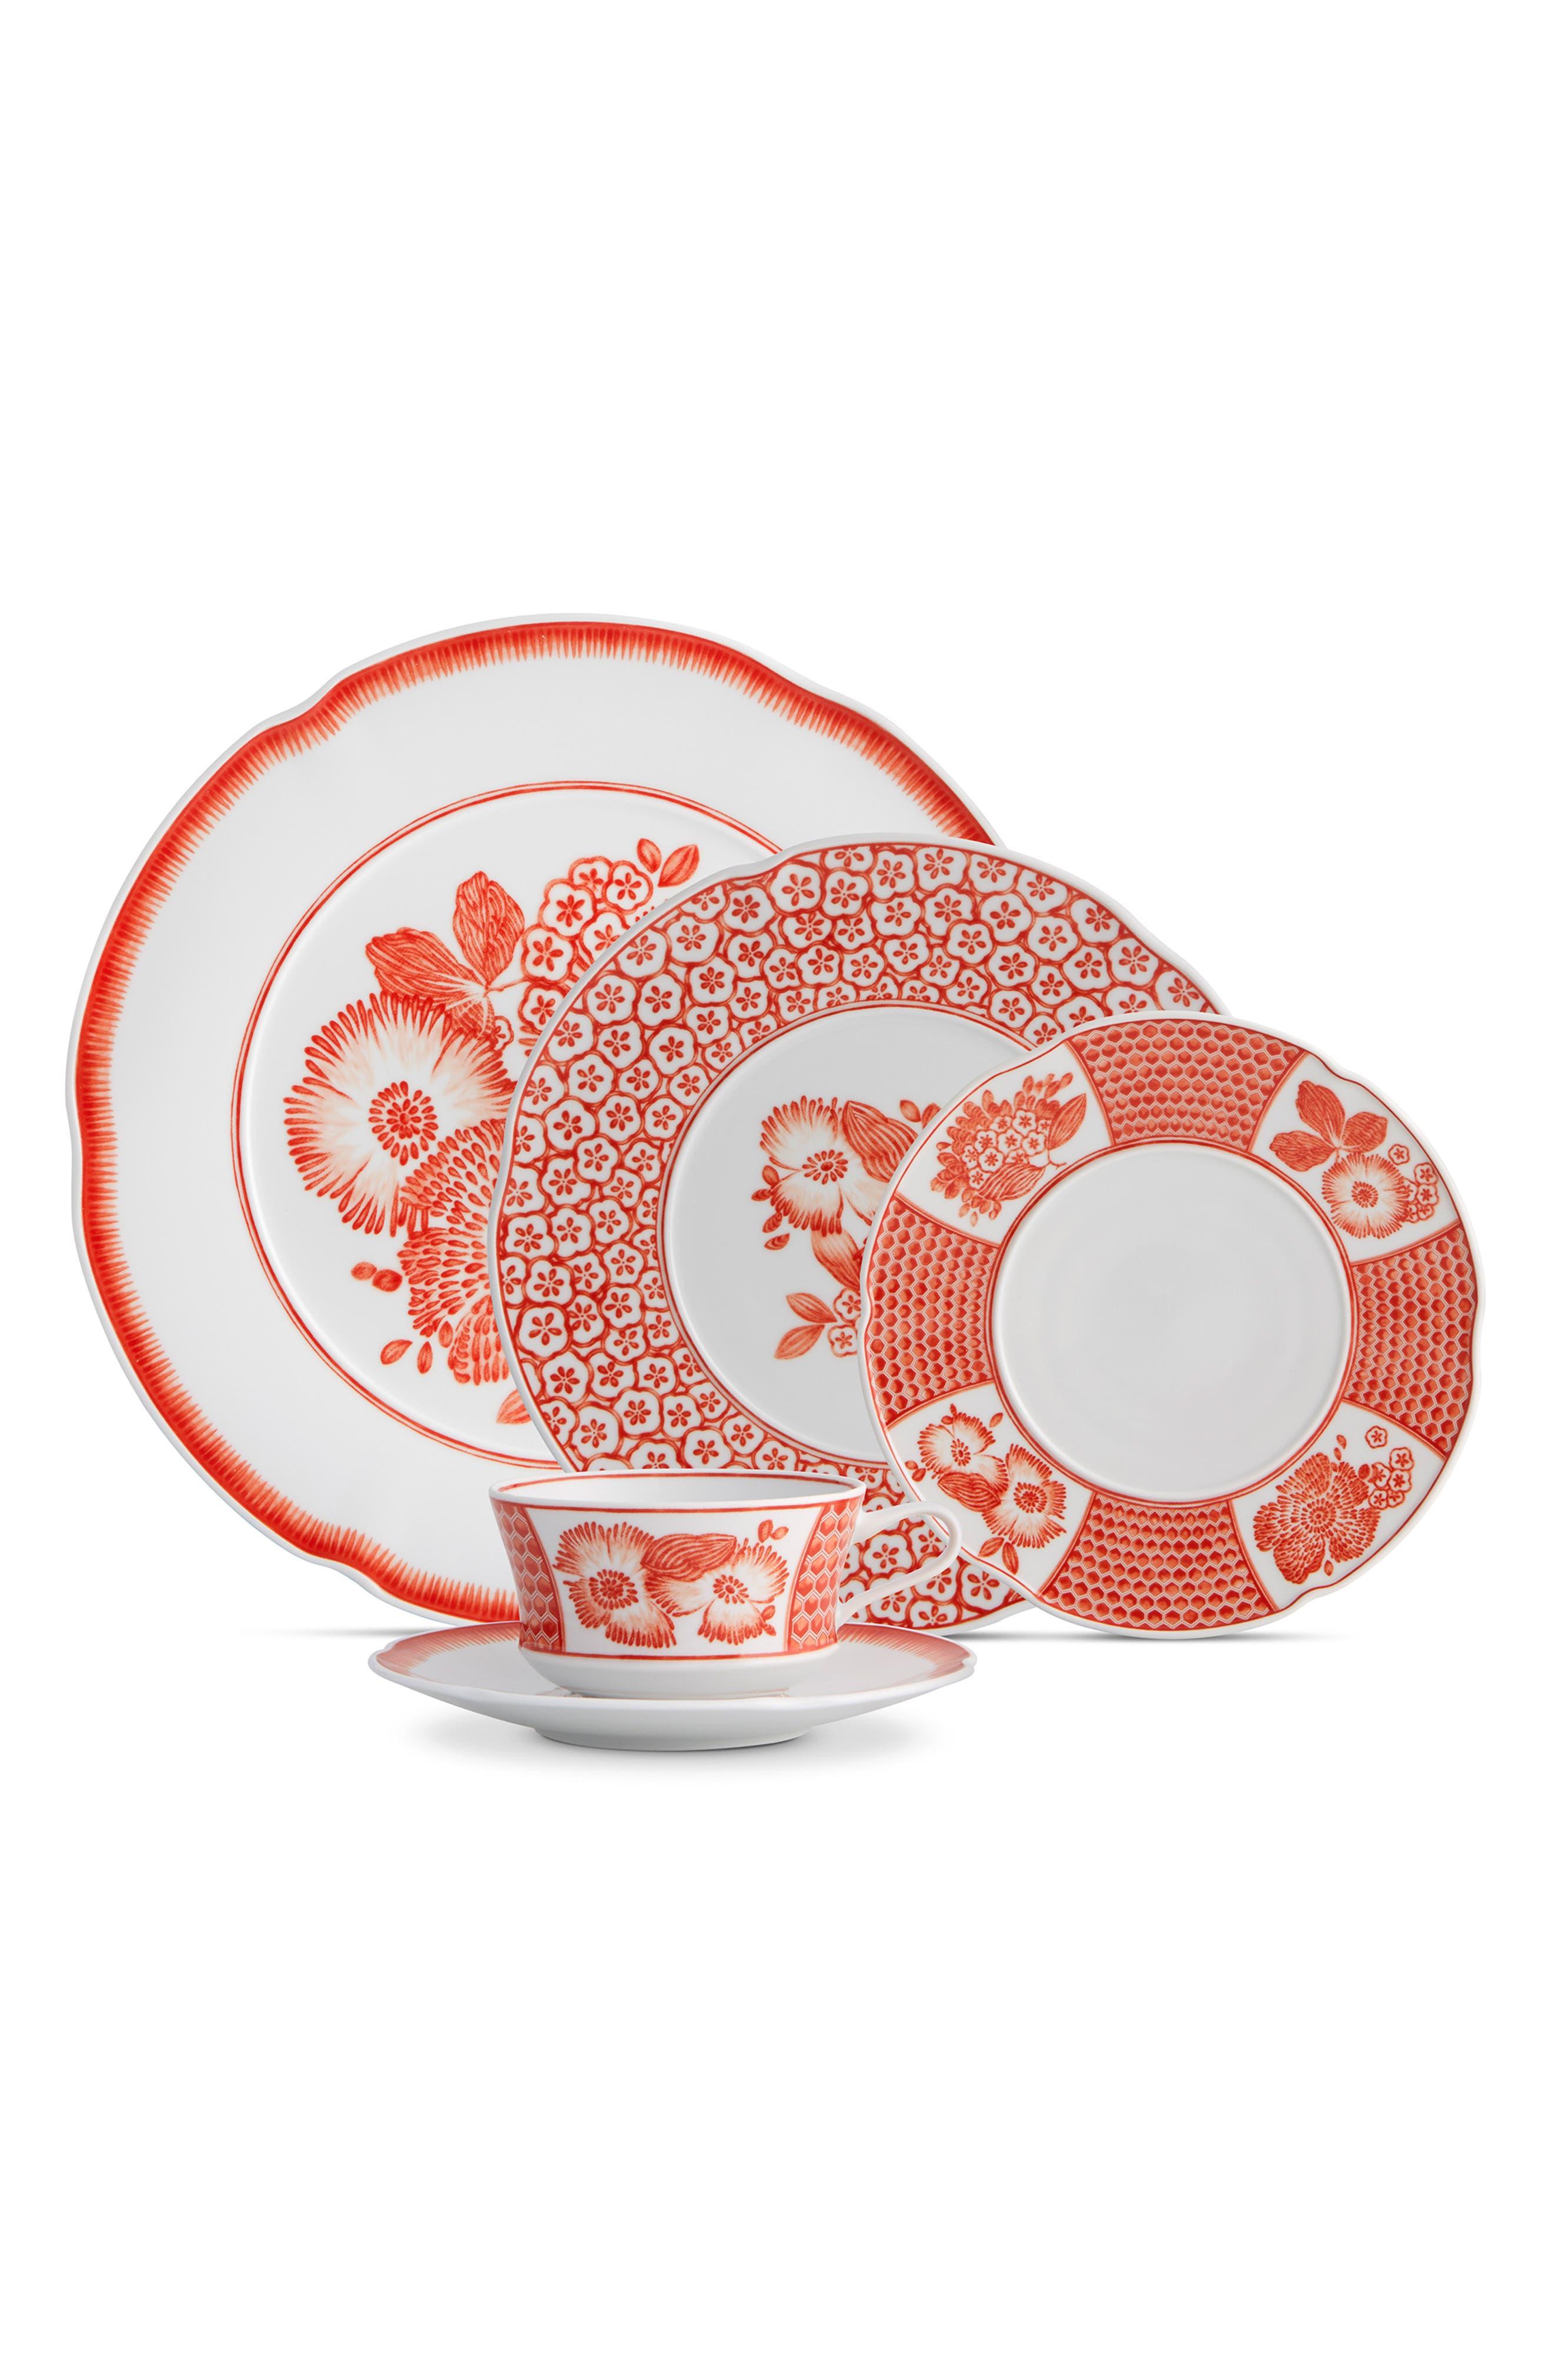 Coralina 20-Piece Dinnerware Set,                             Main thumbnail 1, color,                             WHITE